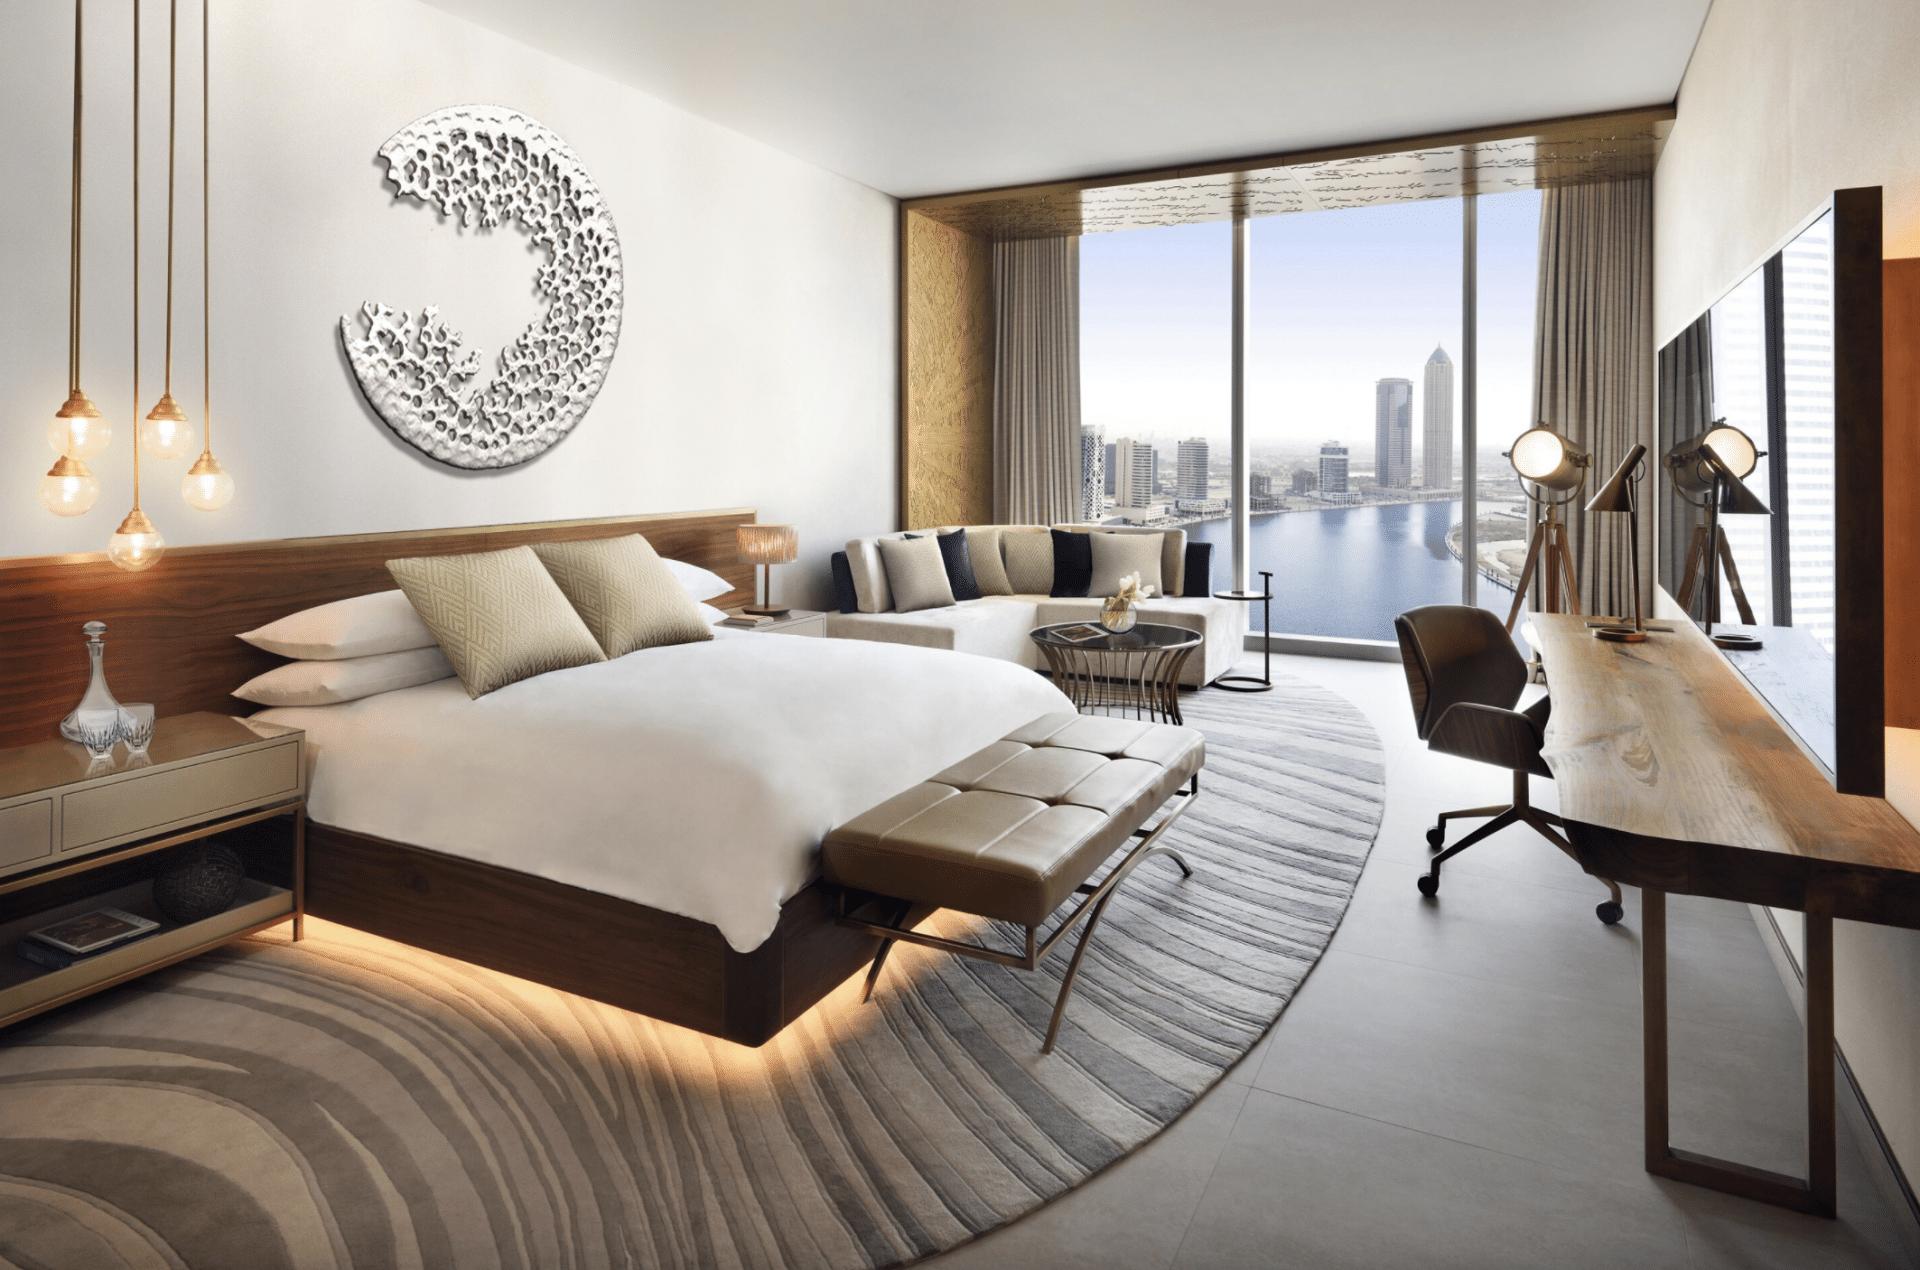 St. Regis Downtown Dubai Zimmer 2021 10 14 Um 11.46.45